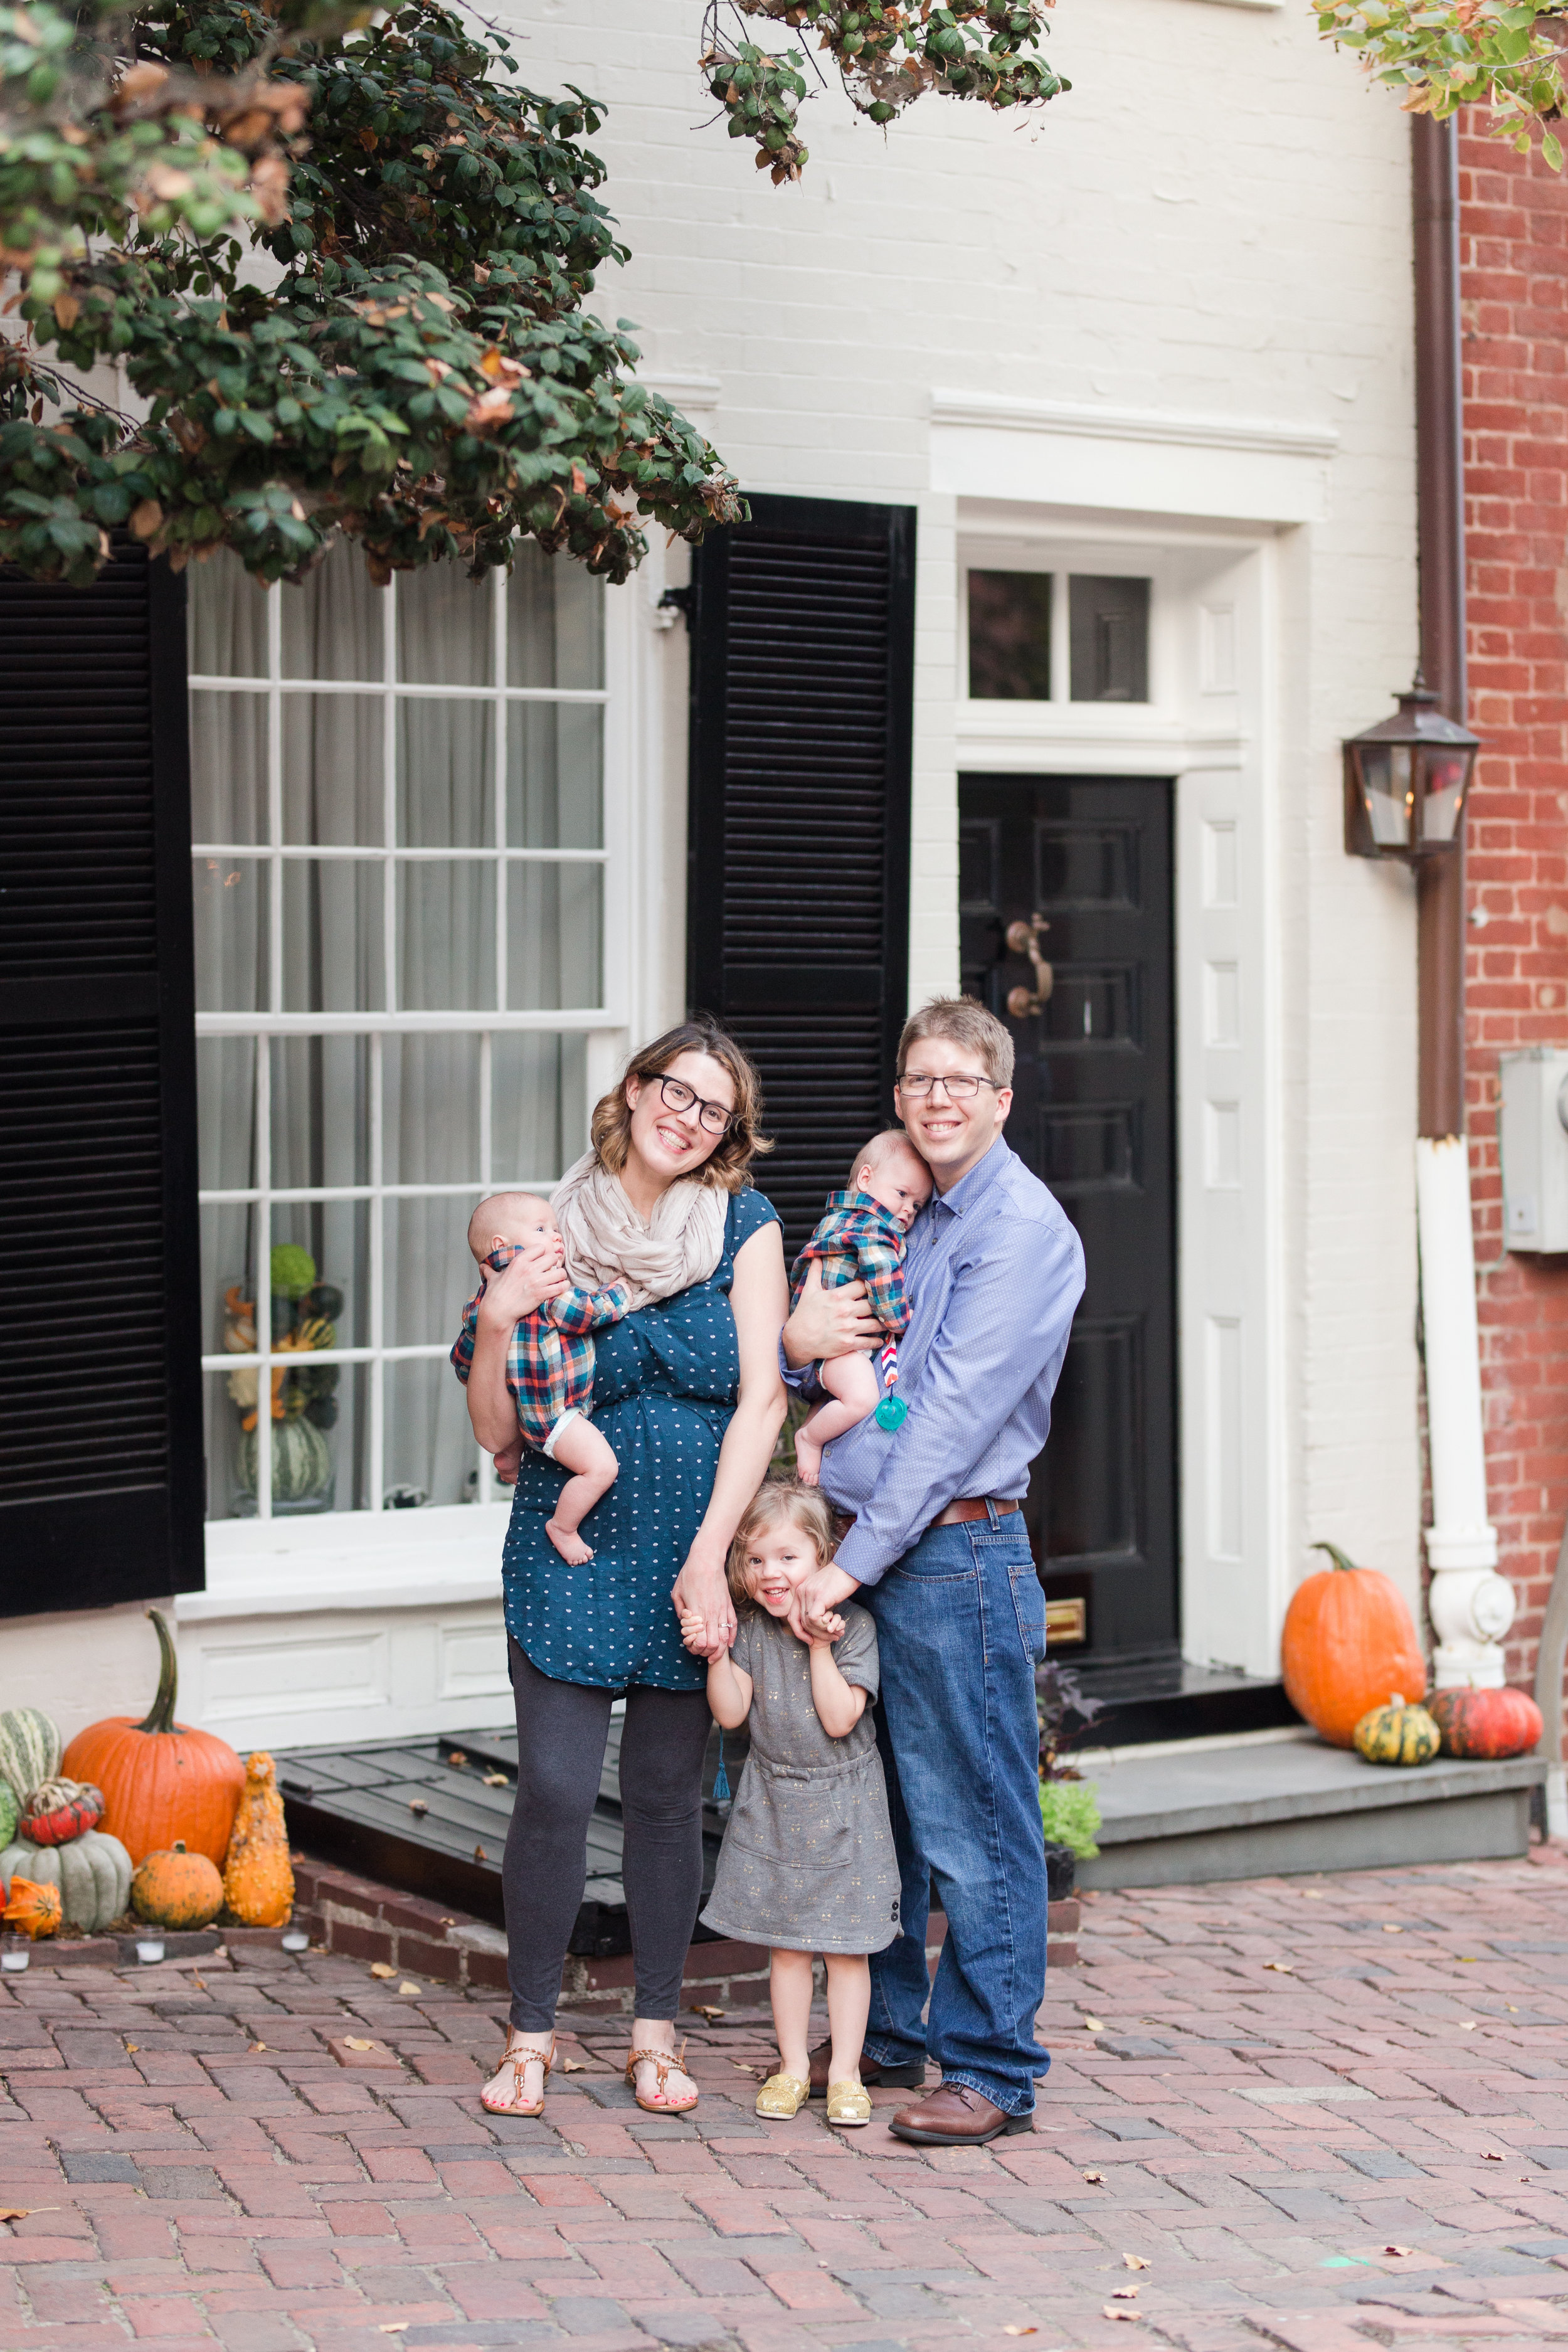 gartonfamily-old-town-alexandria-fall-2017-2.jpg